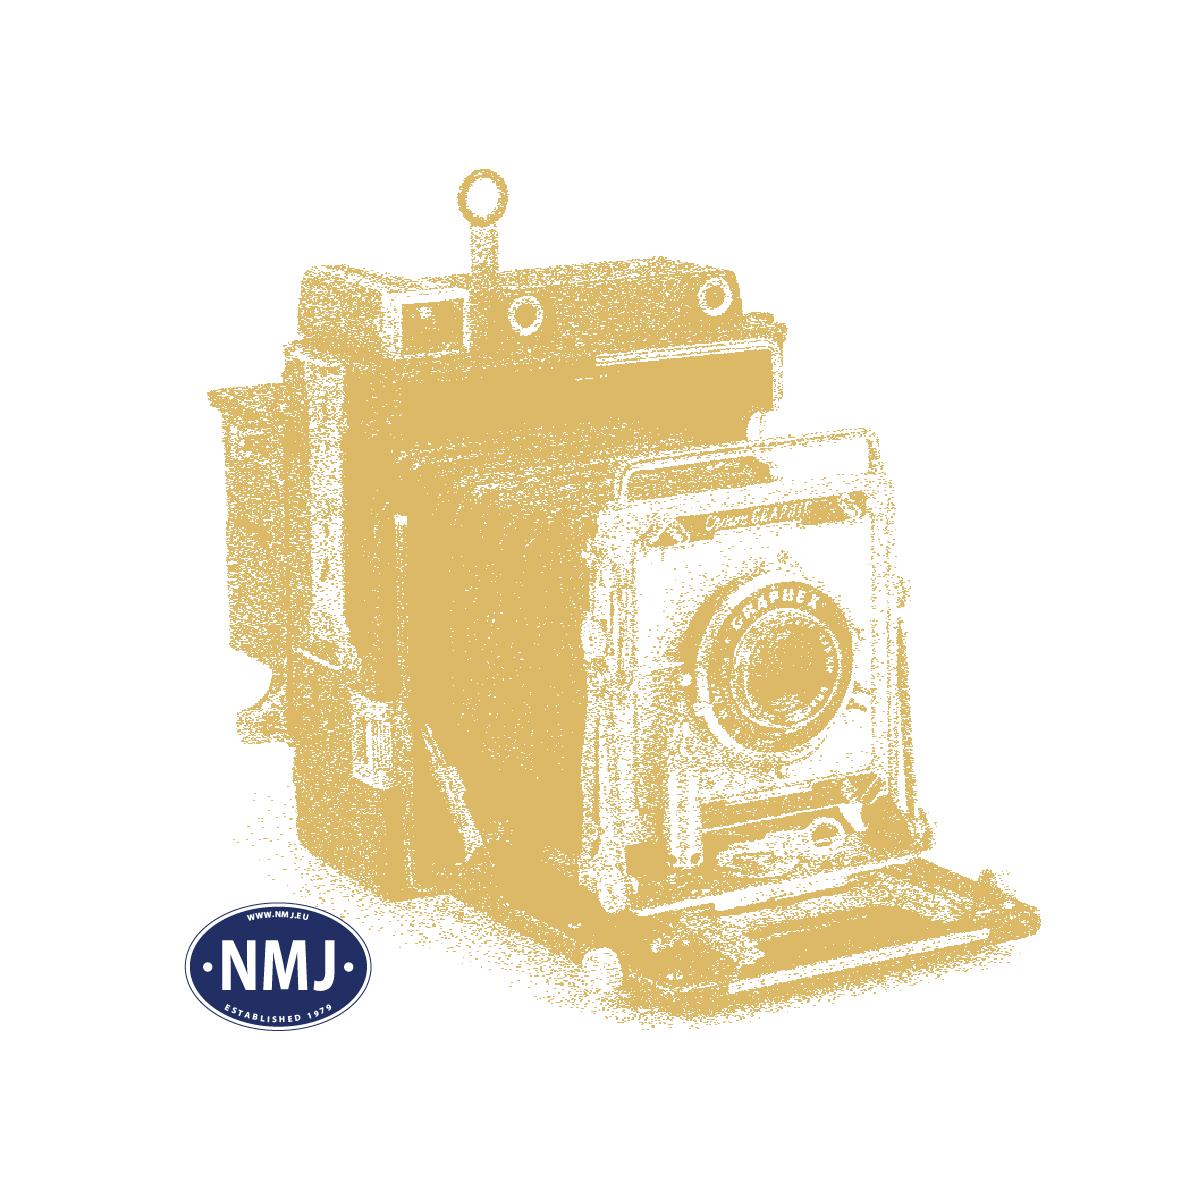 NMJT245401 - NMJ Topline SNCB 204003, 0-Scale, DCC Sound